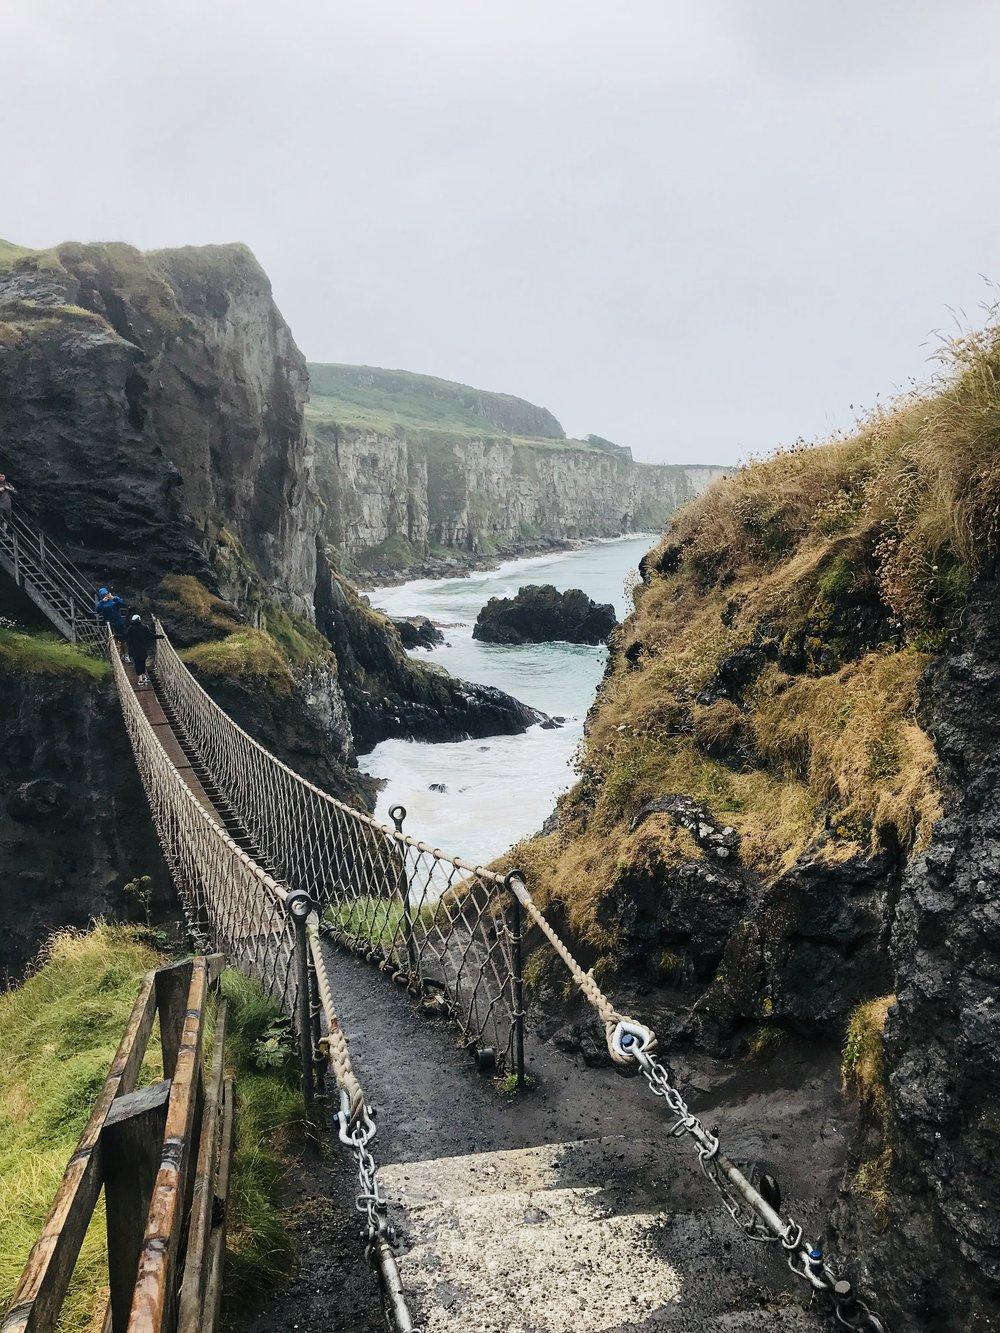 Crossing the Carrick-a-Rede Bridge